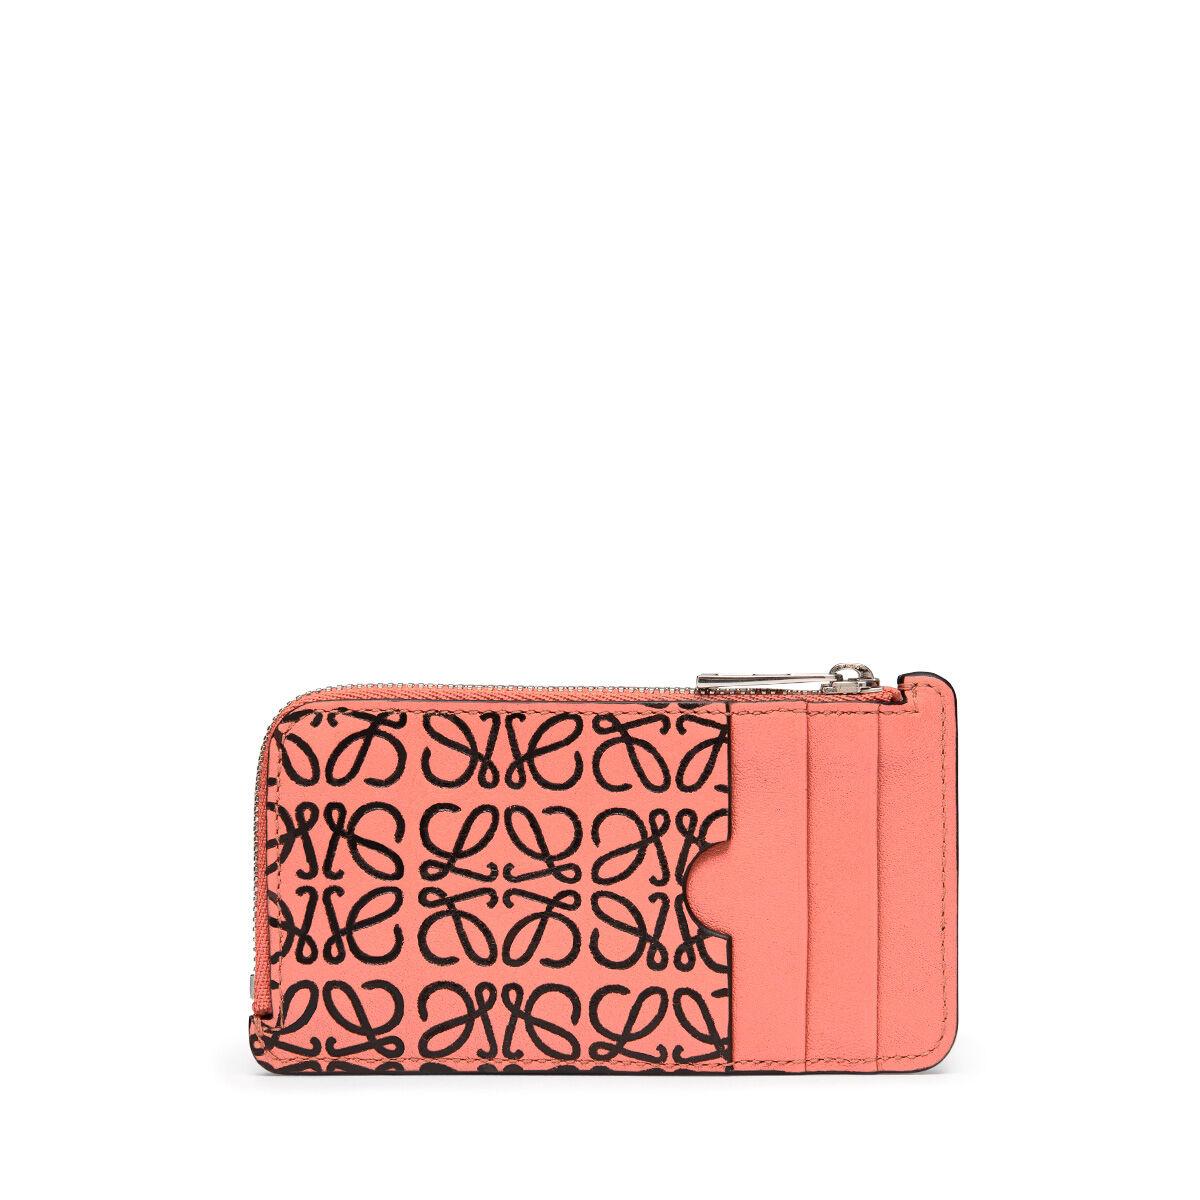 LOEWE Coin/Card Holder Pink Tulip/Black all